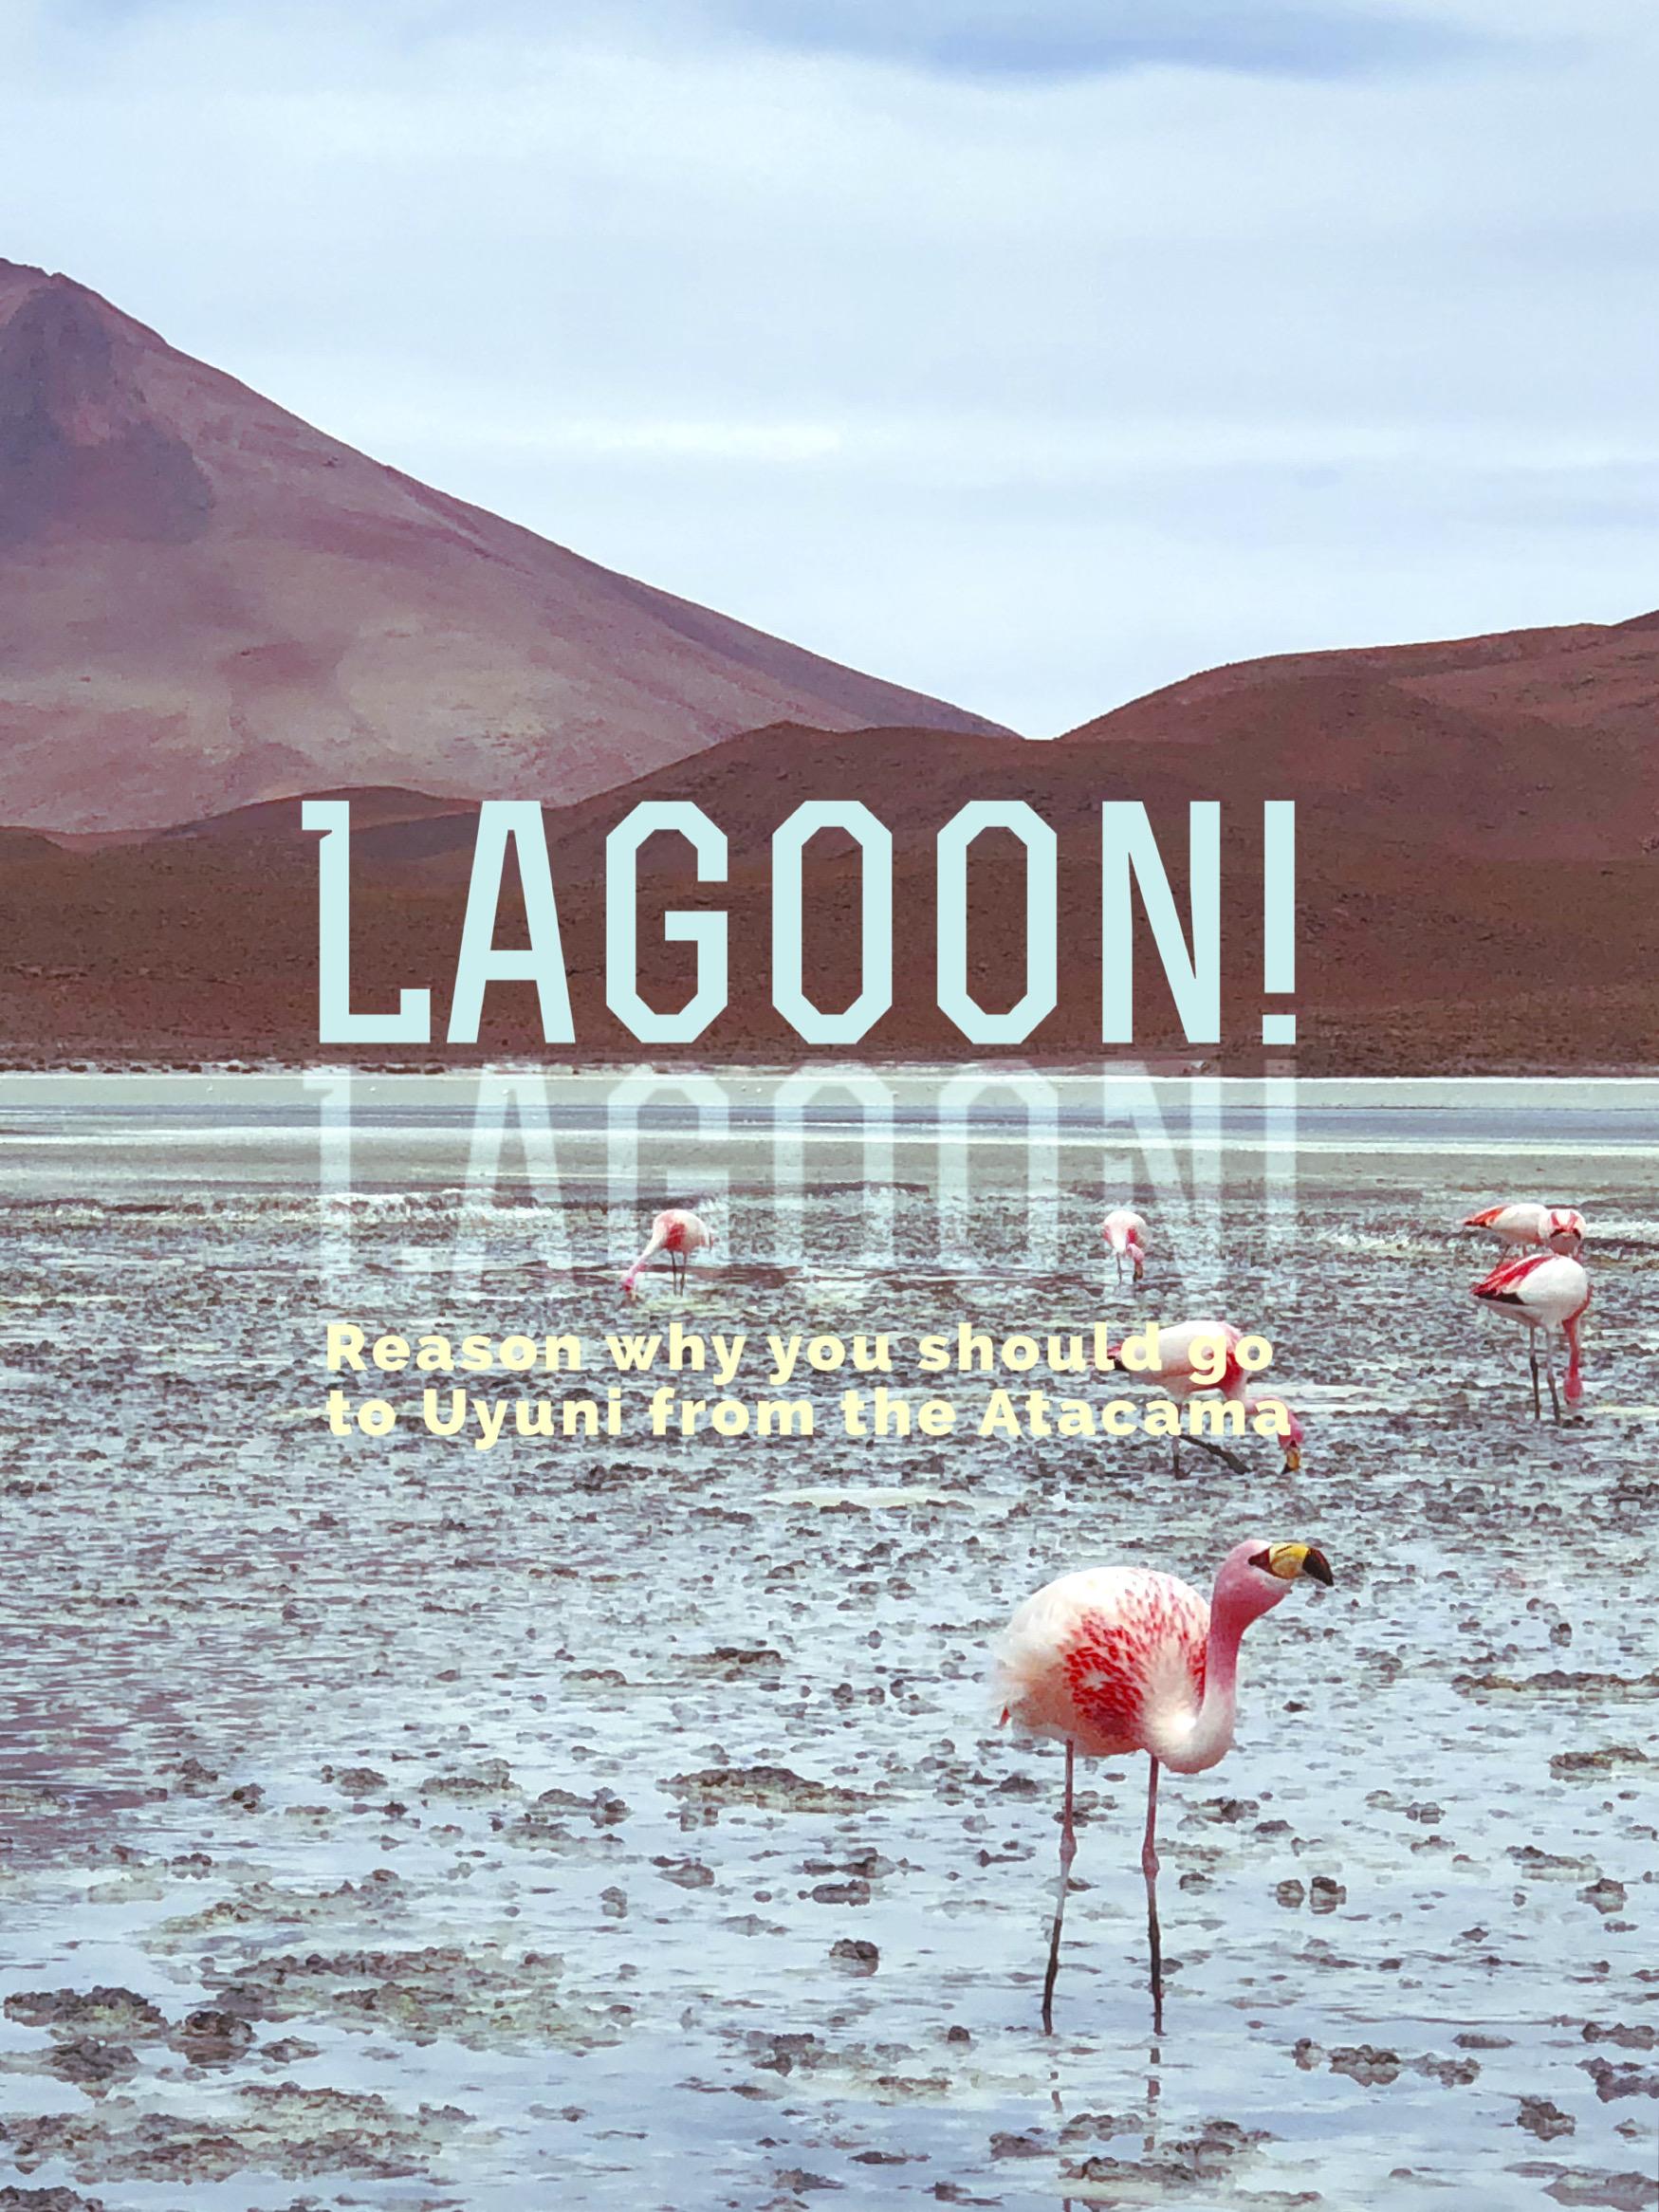 Lagoon! Lagoon! Reasons Why You Should Go to Uyuni from the Atacama